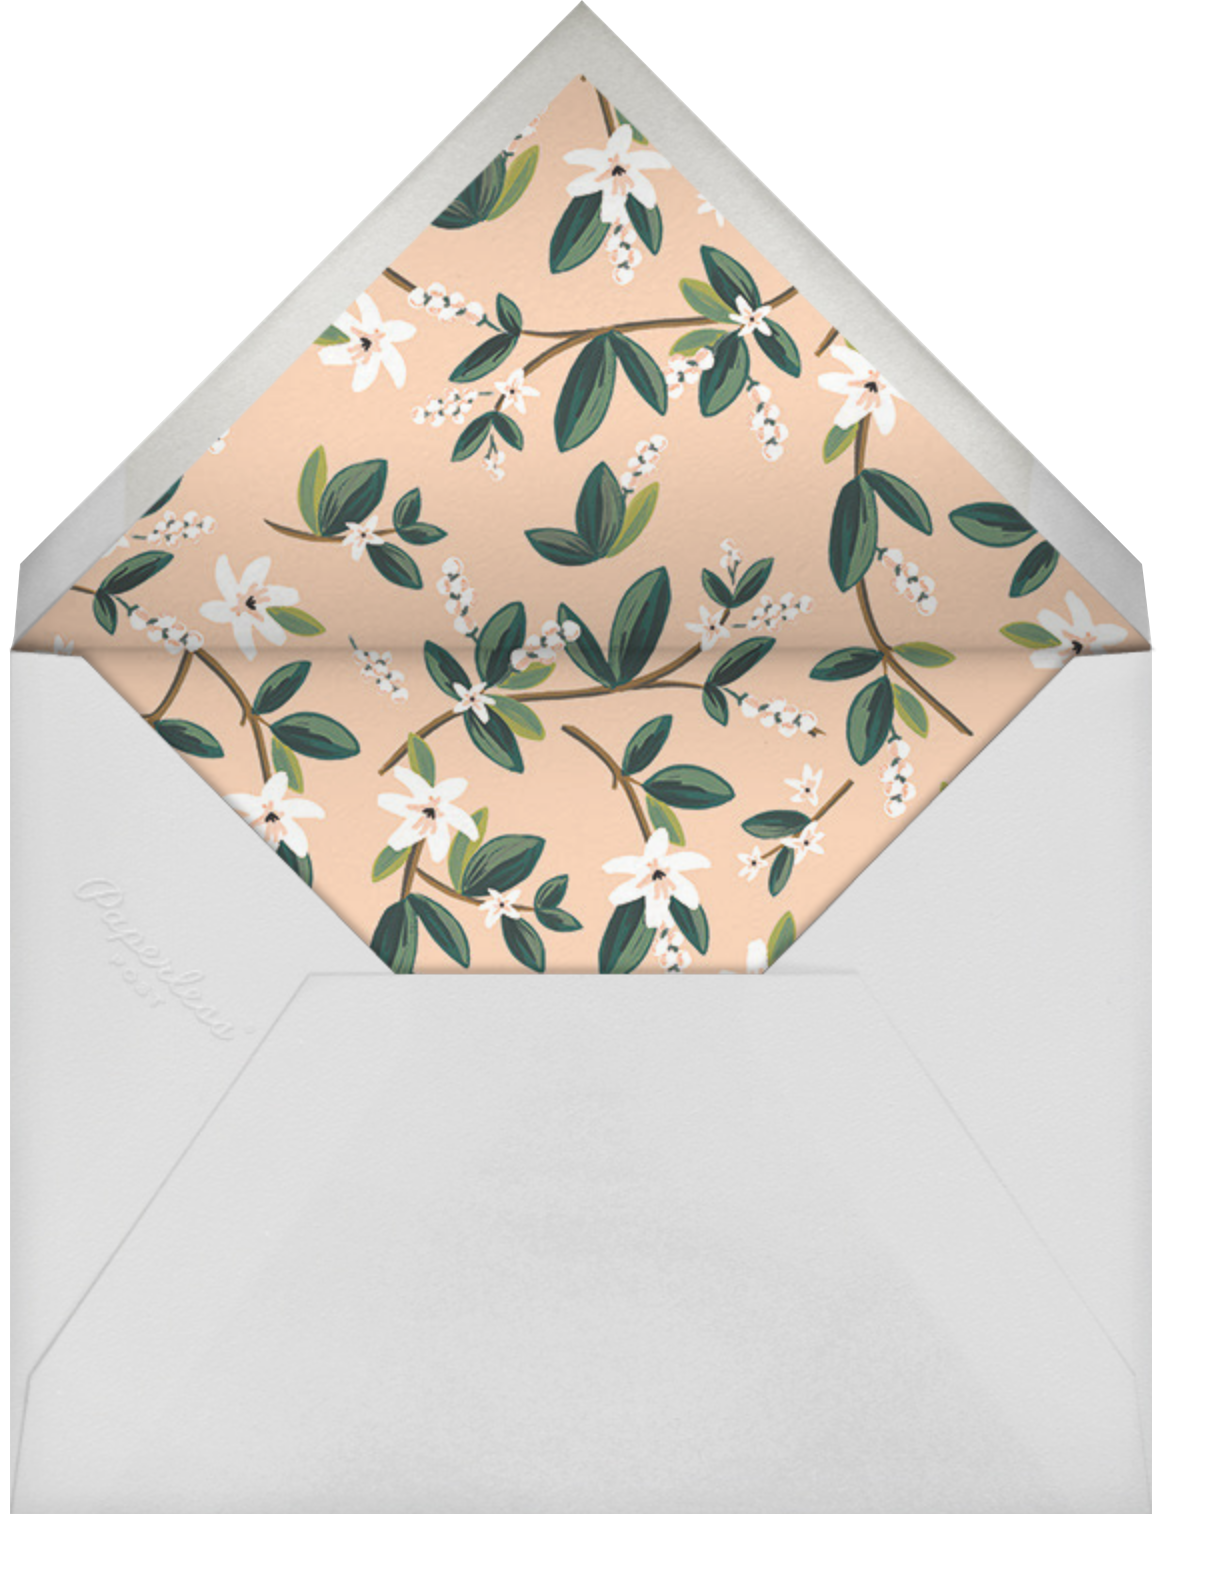 November Herbarium (Invitation) - Rifle Paper Co. - Virtual wedding invitations - envelope back